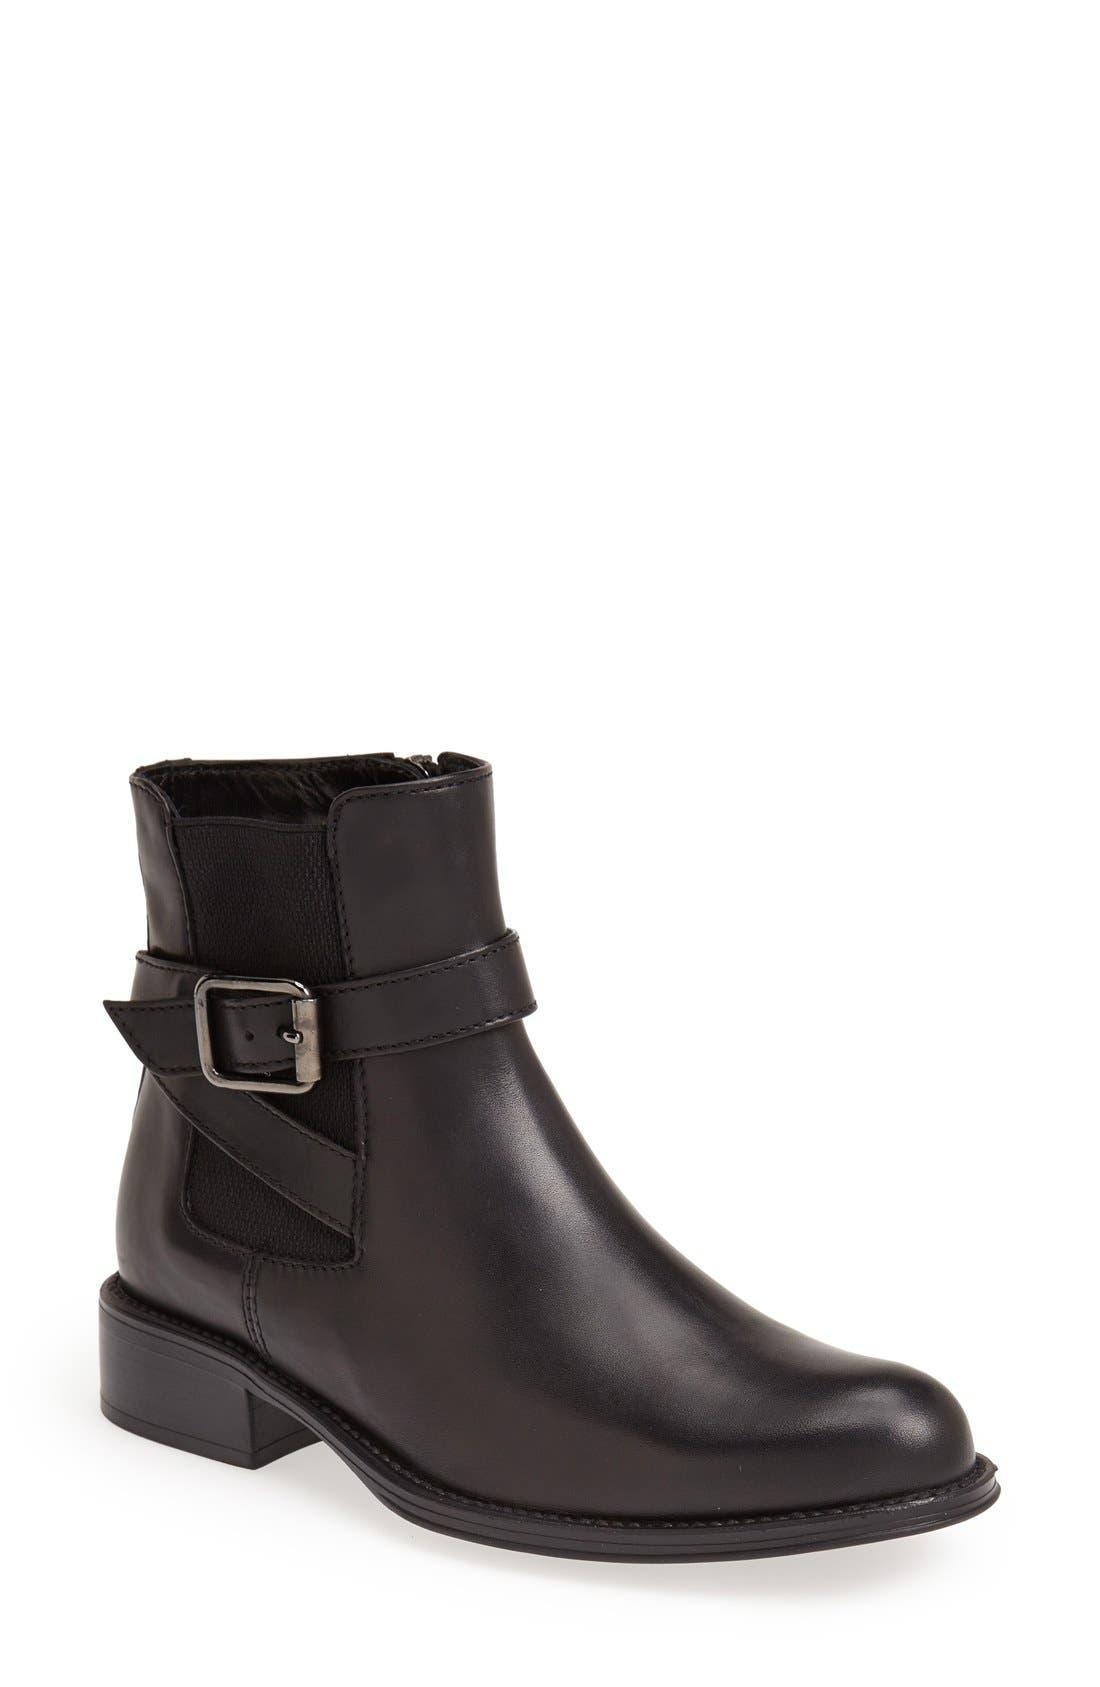 Main Image - Aquatalia 'Uriah' Weatherproof Ankle Boot (Women)